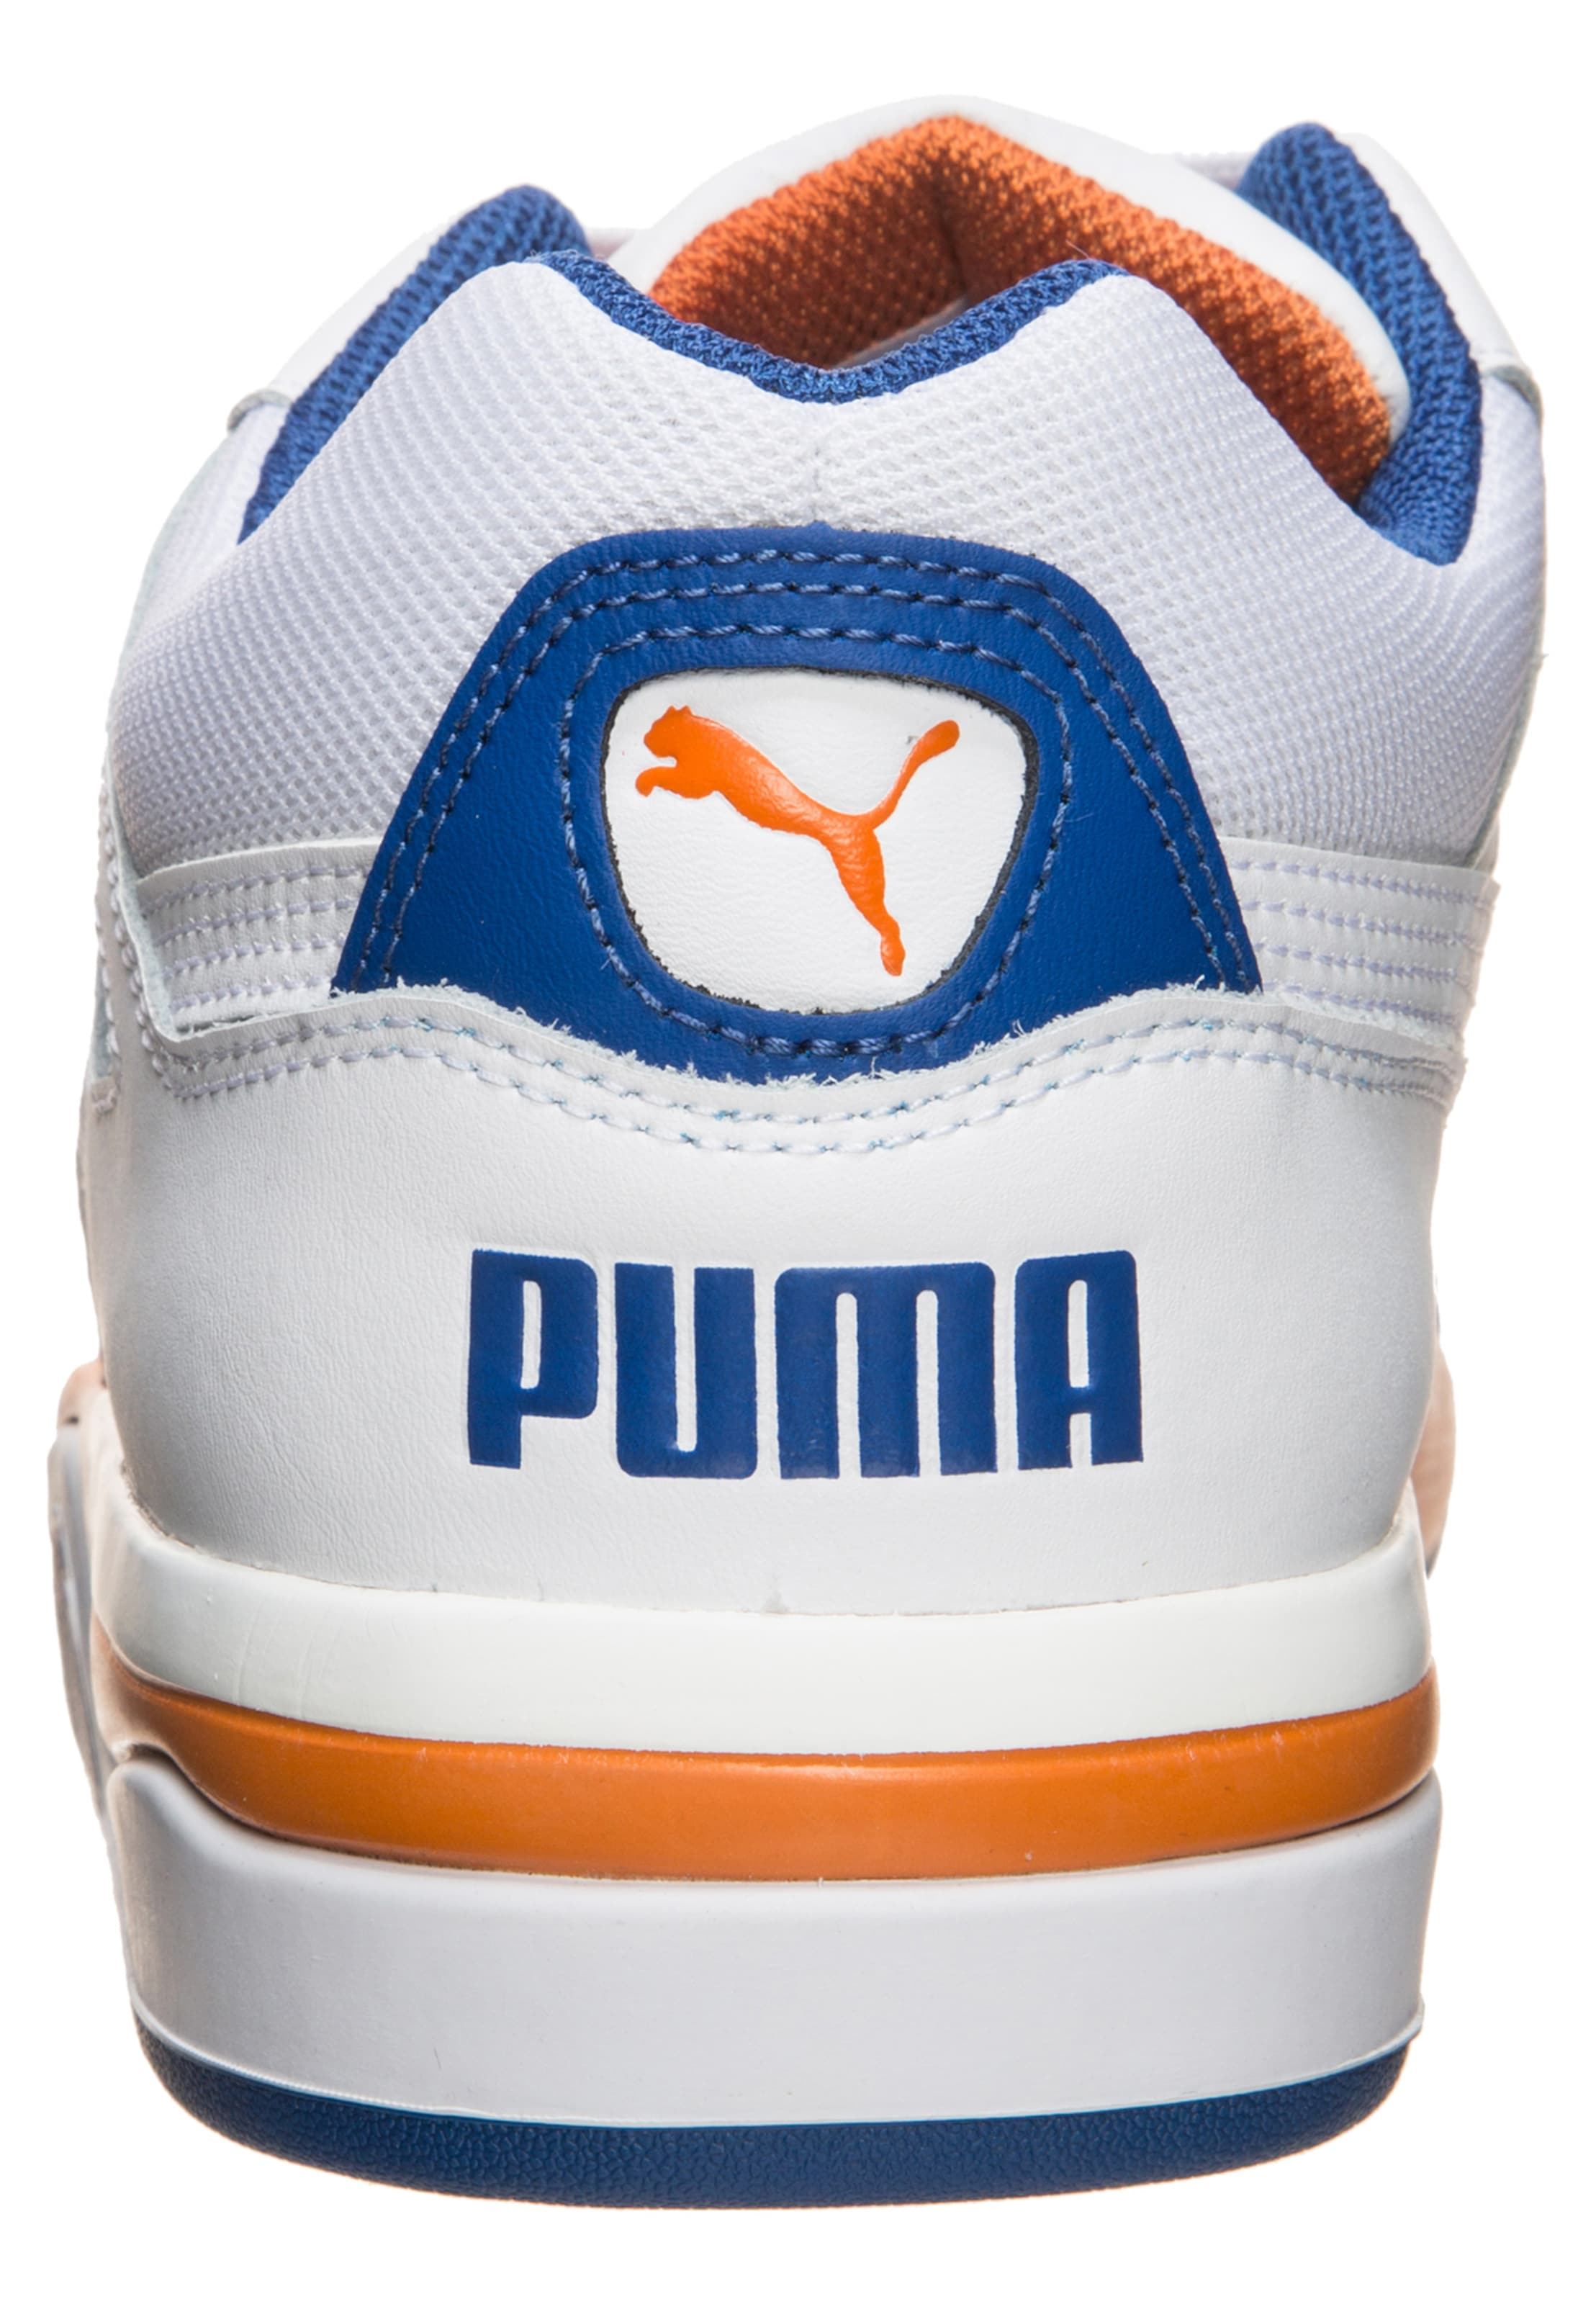 'palace BleuOrange Blanc Puma Guard' Basses En Baskets NkZPOXw8n0